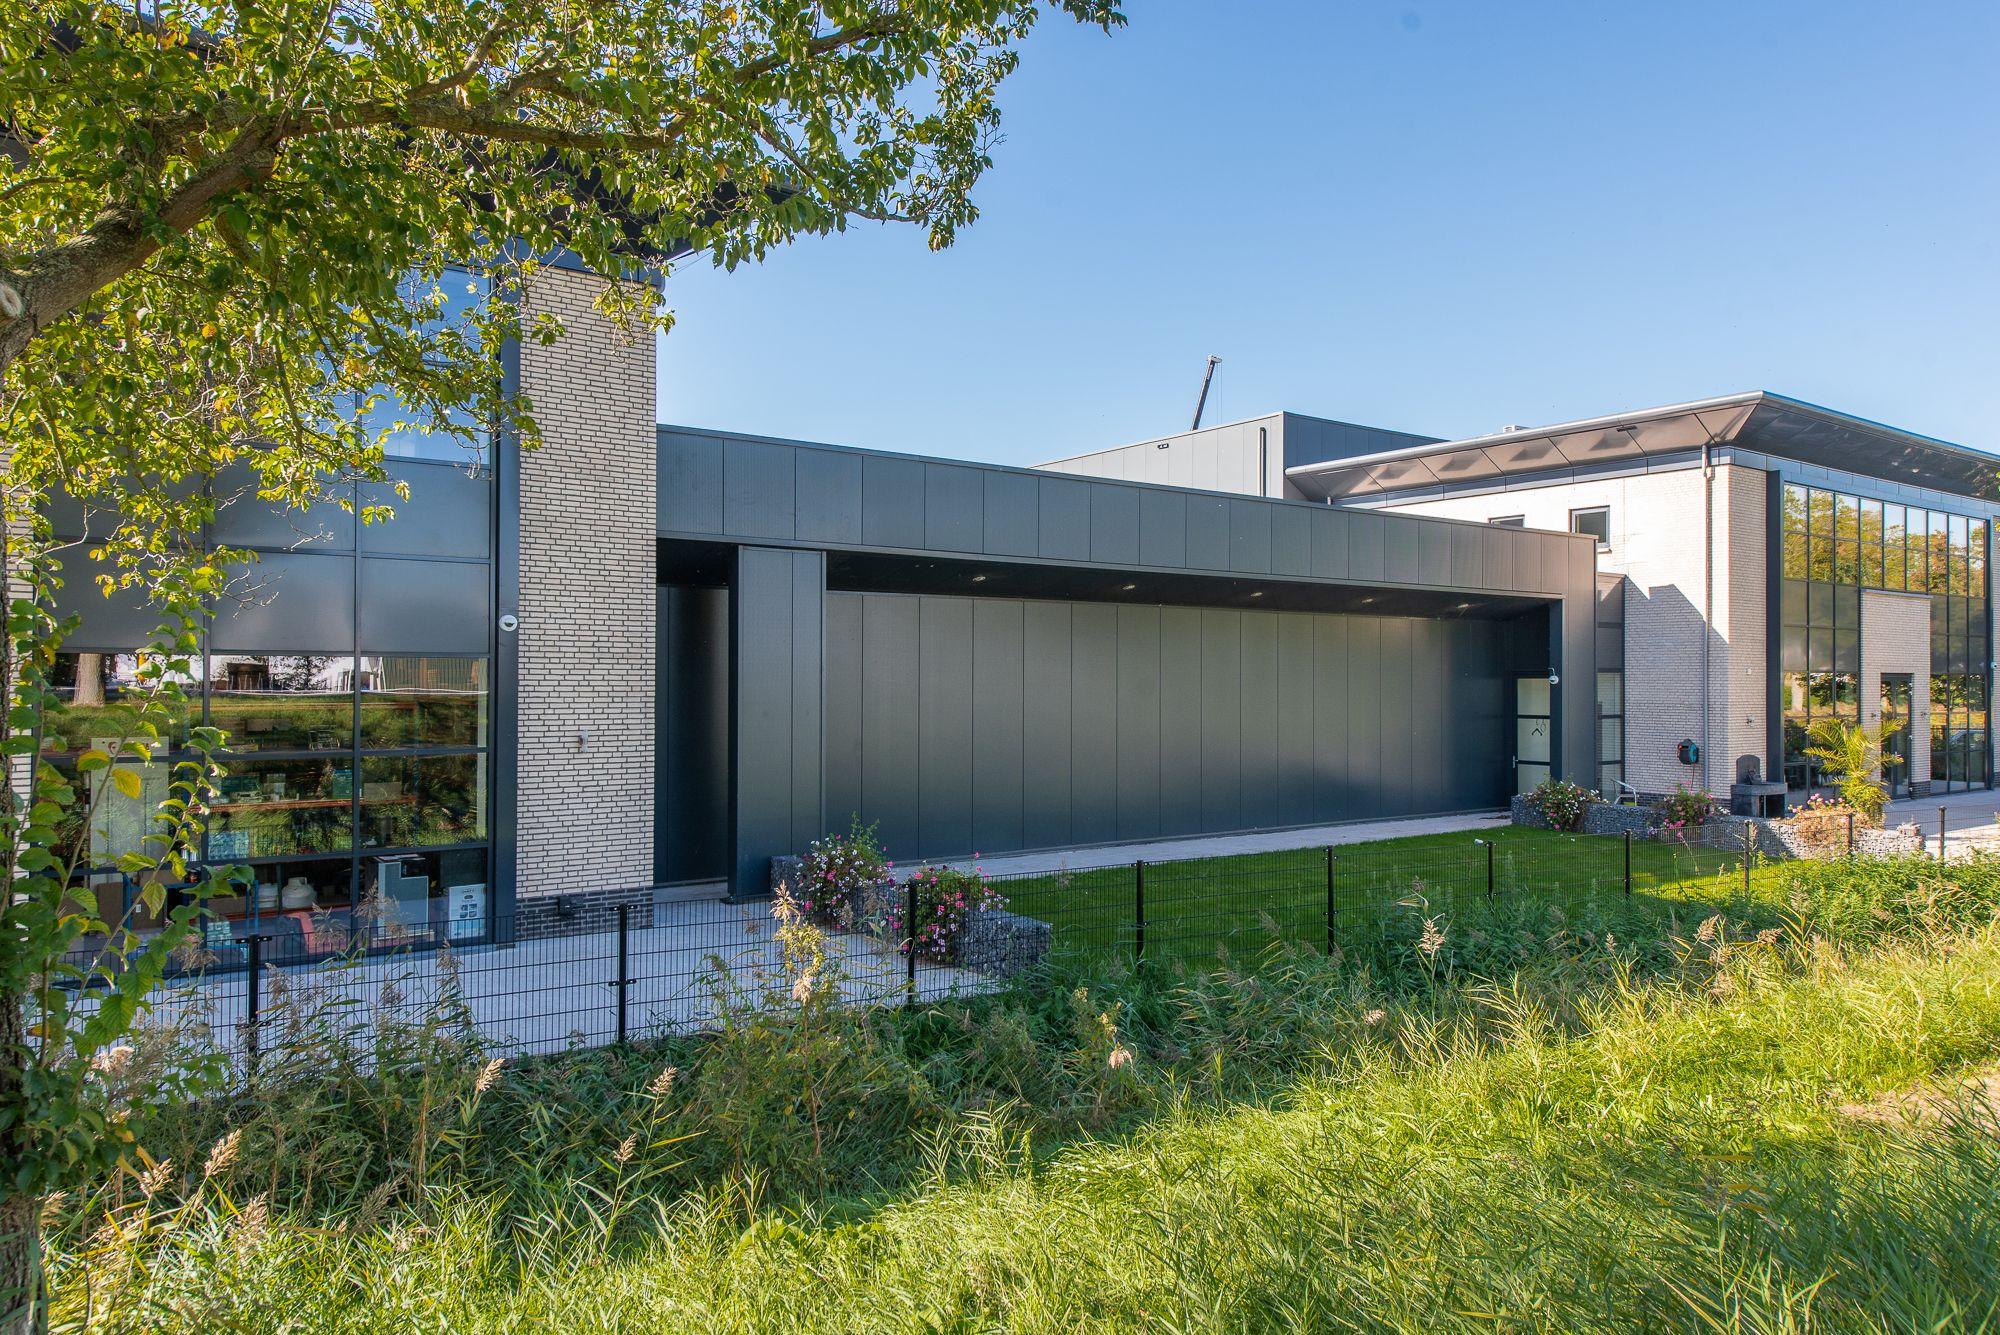 Badé - Outdoor Living - Bouwgroep Schrijver on Bade Outdoor Living id=75073